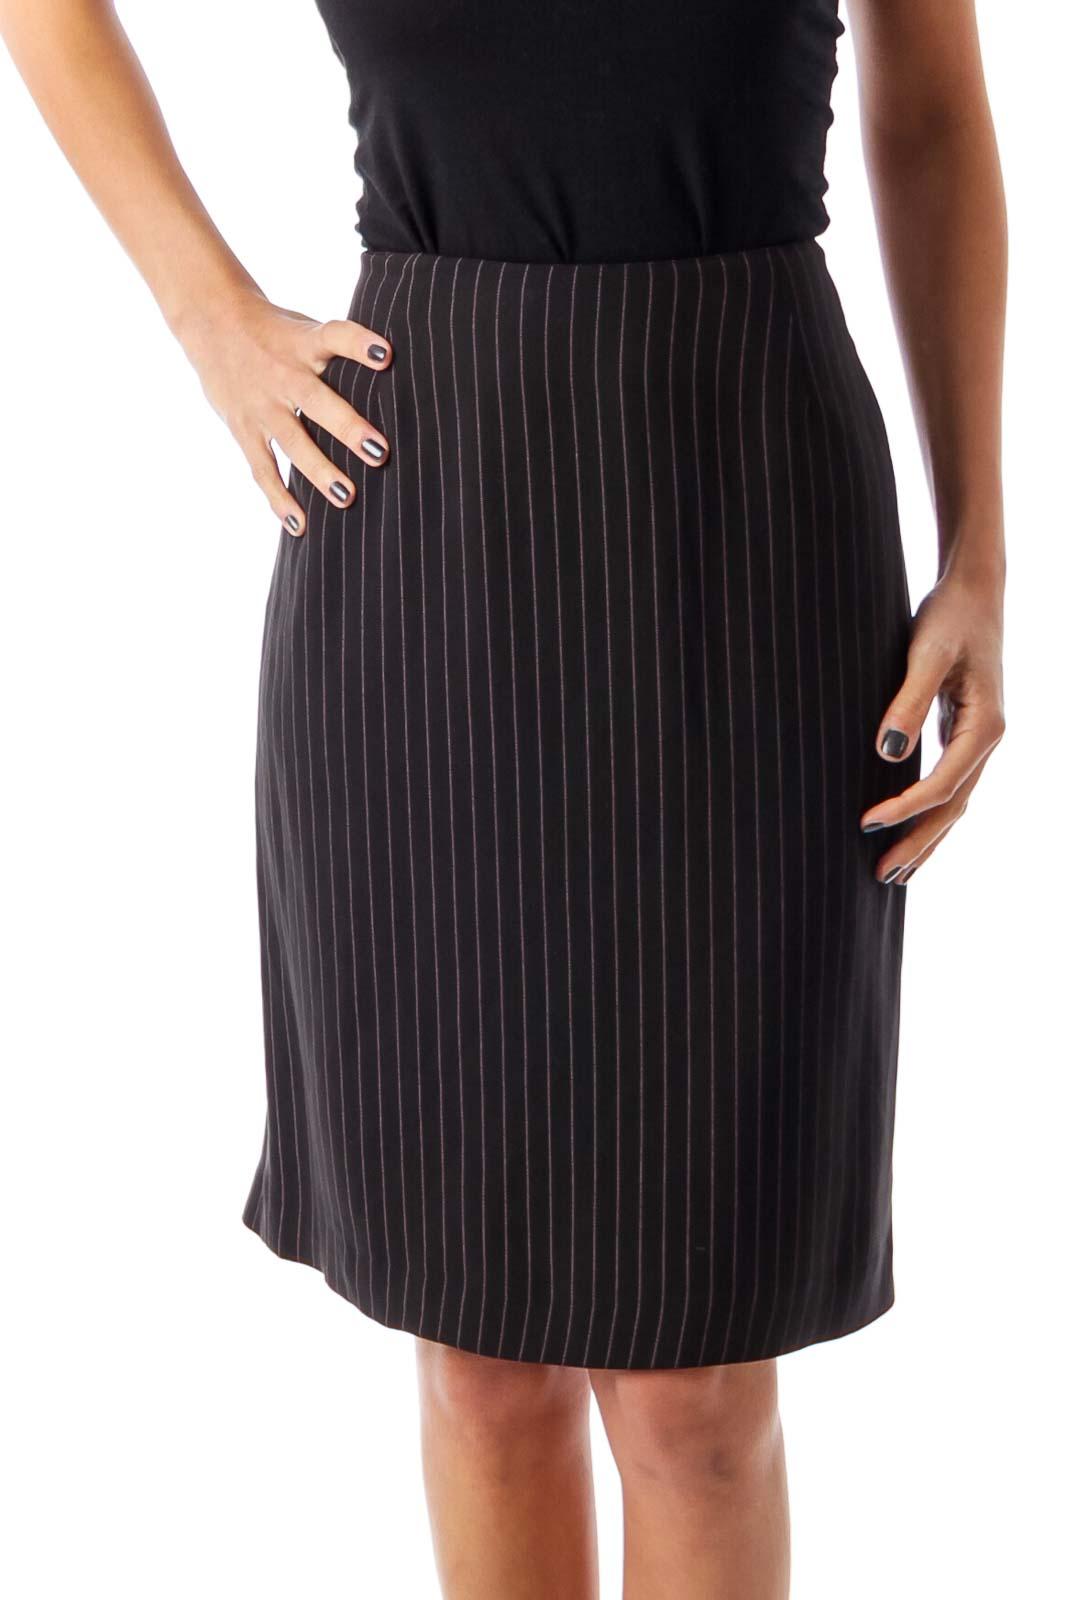 Black Stripe Pencil Skirt Front